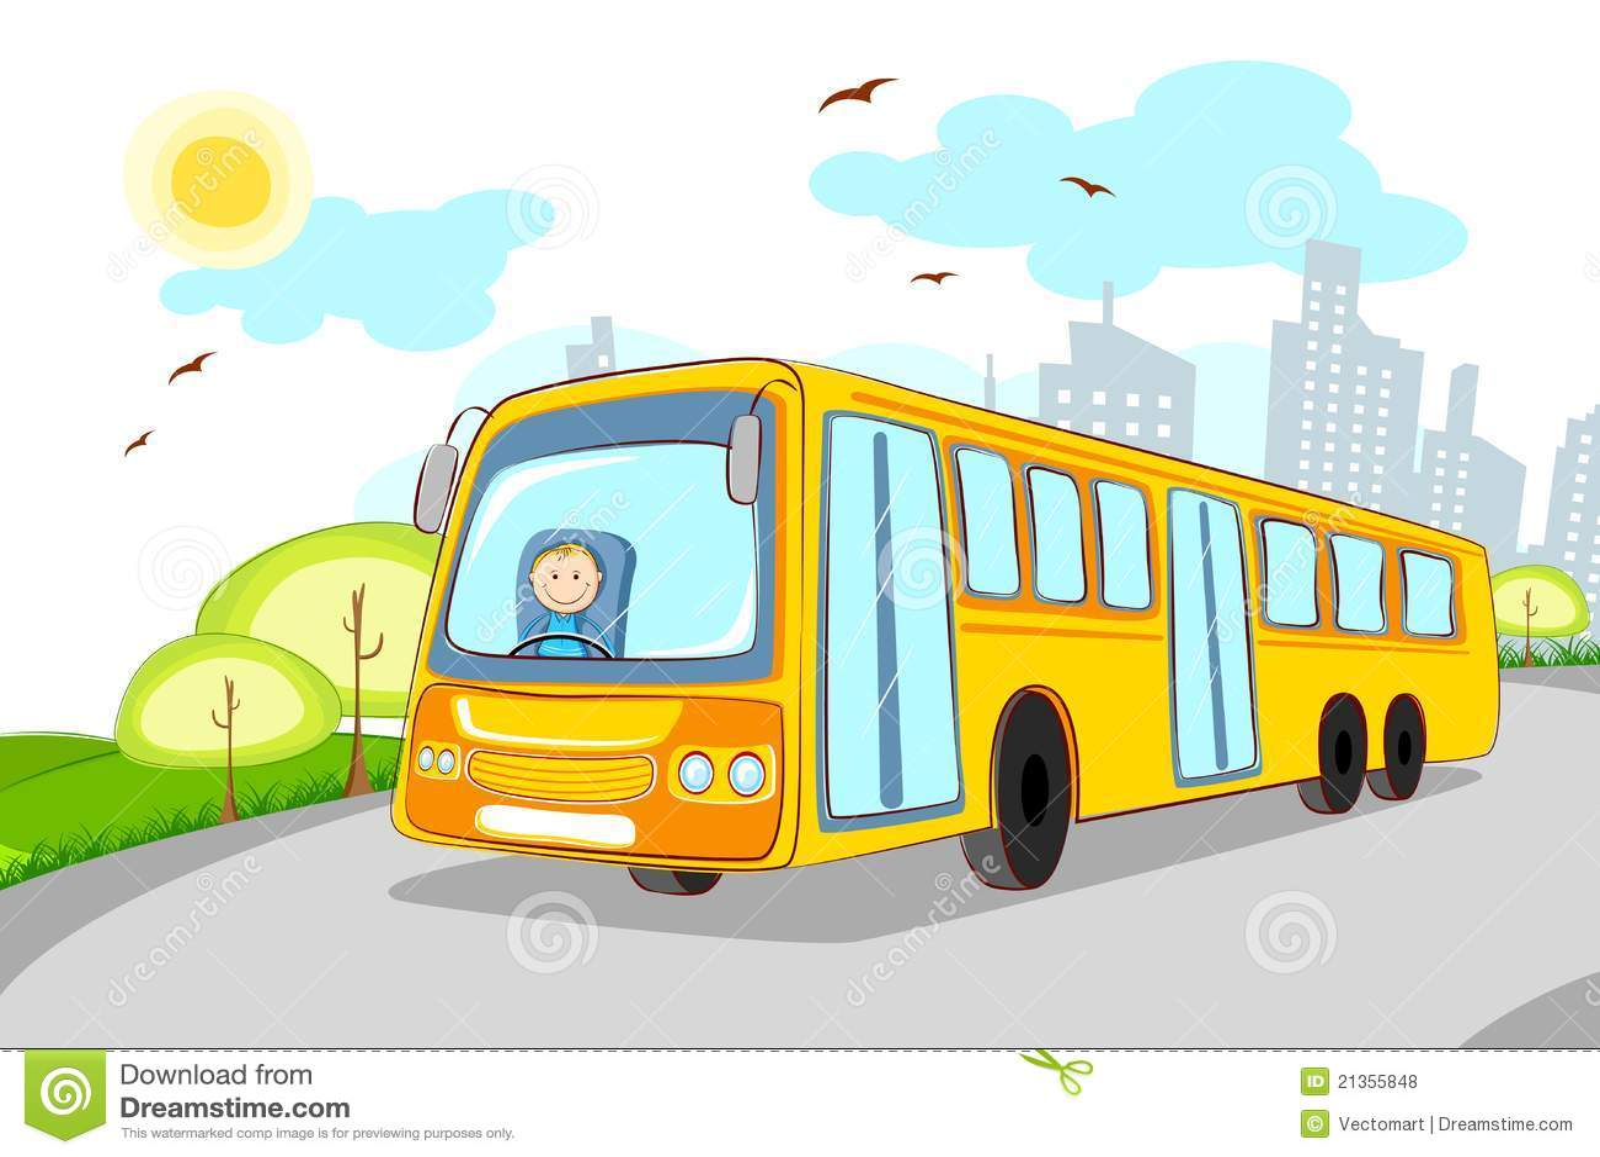 Driver In School Bus Stock Illustration Illustration Of Road 21355848